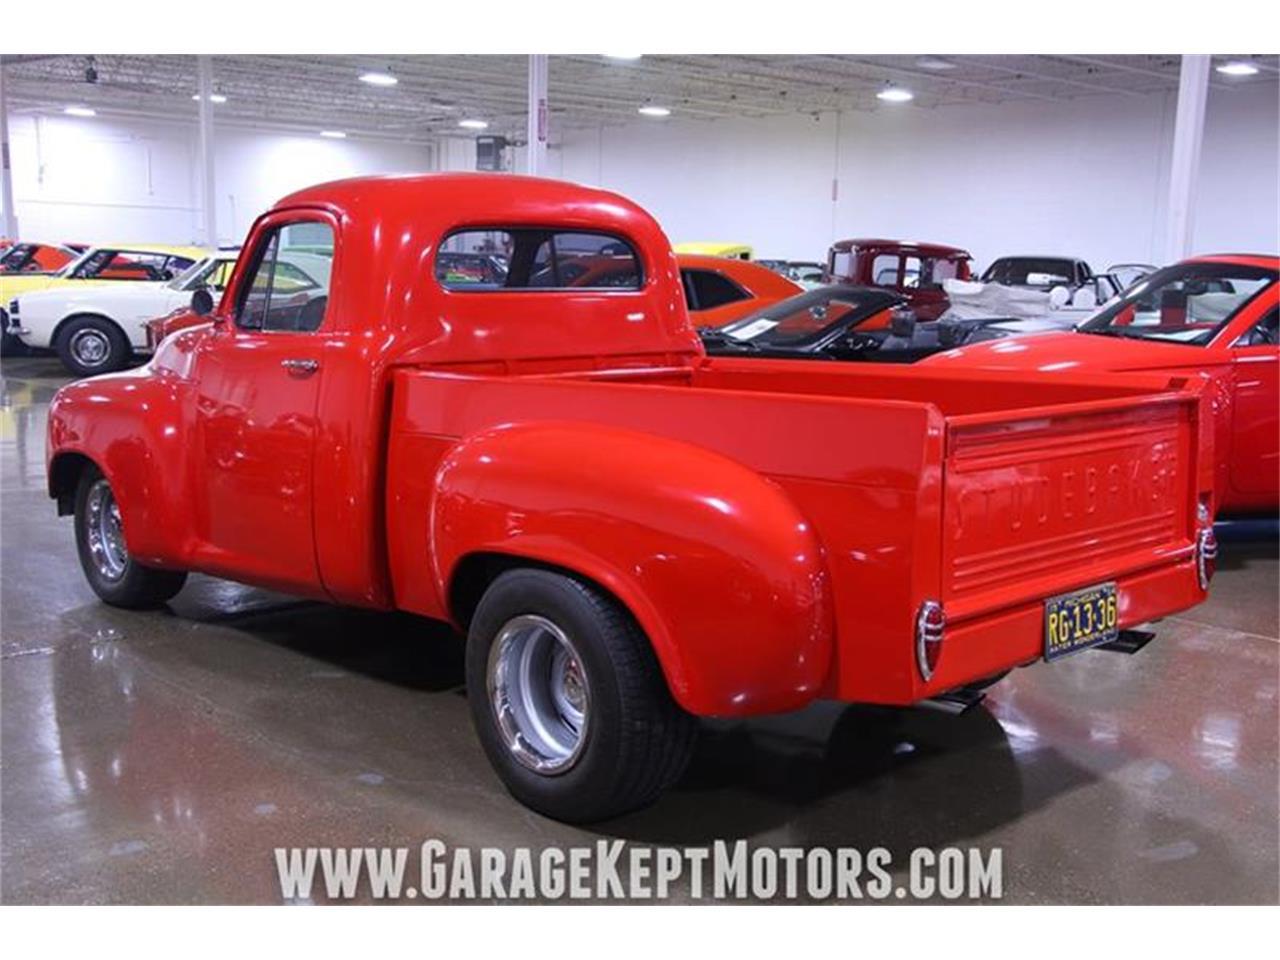 For Sale: 1954 Studebaker Pickup in Grand Rapids, Michigan